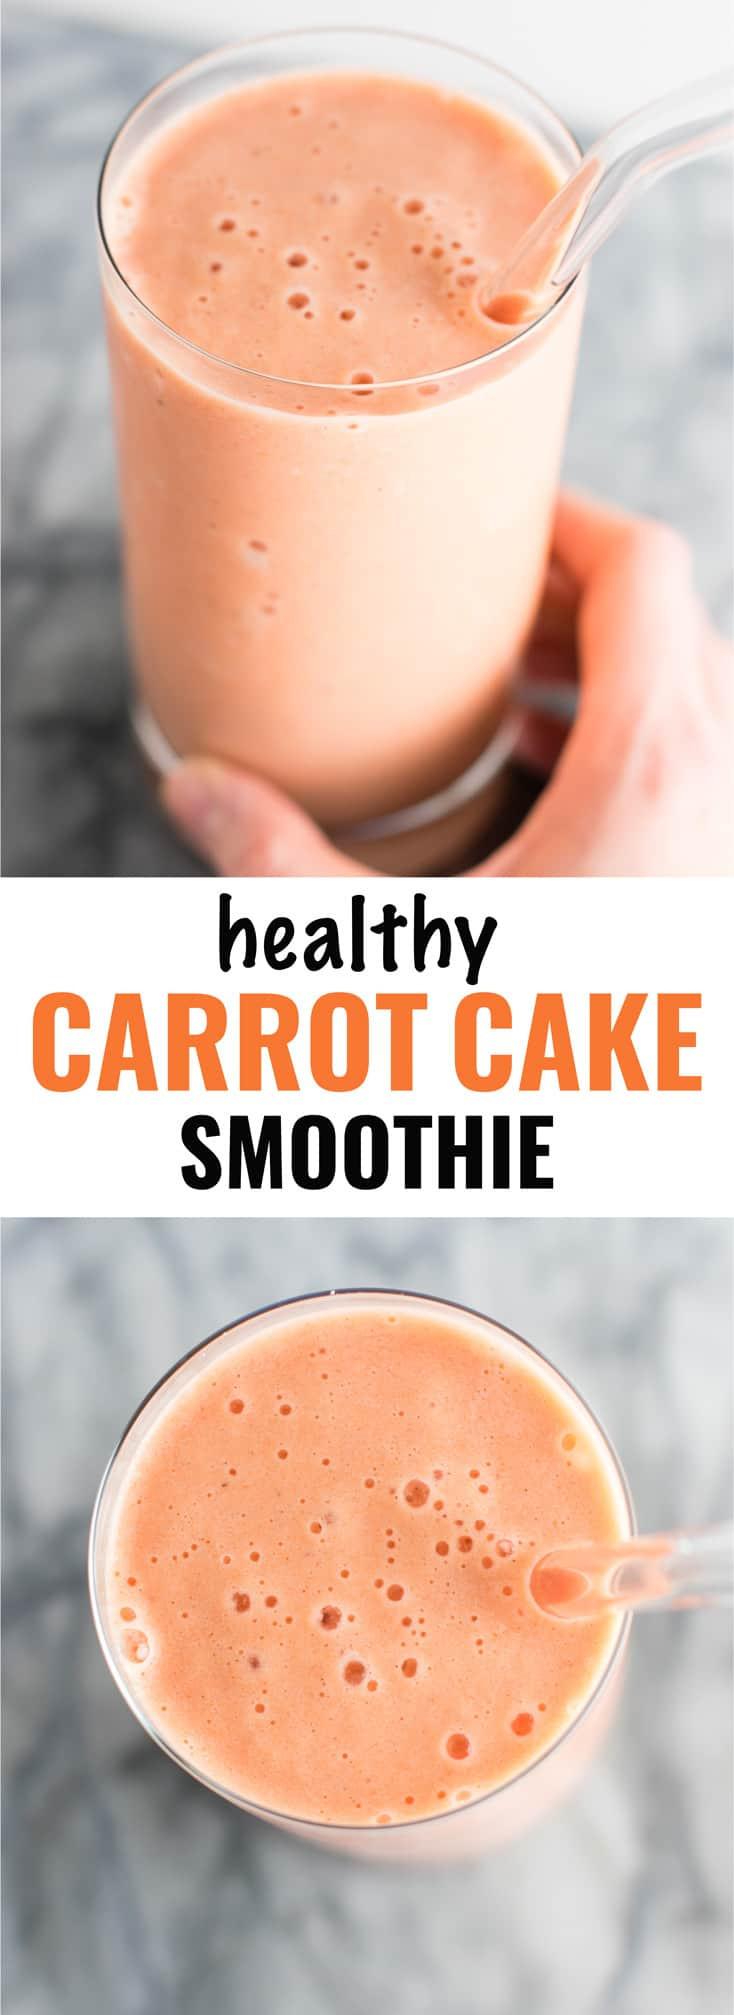 Carrot Cake Smoothie  Healthy Carrot Cake Smoothie Recipe with greek yogurt